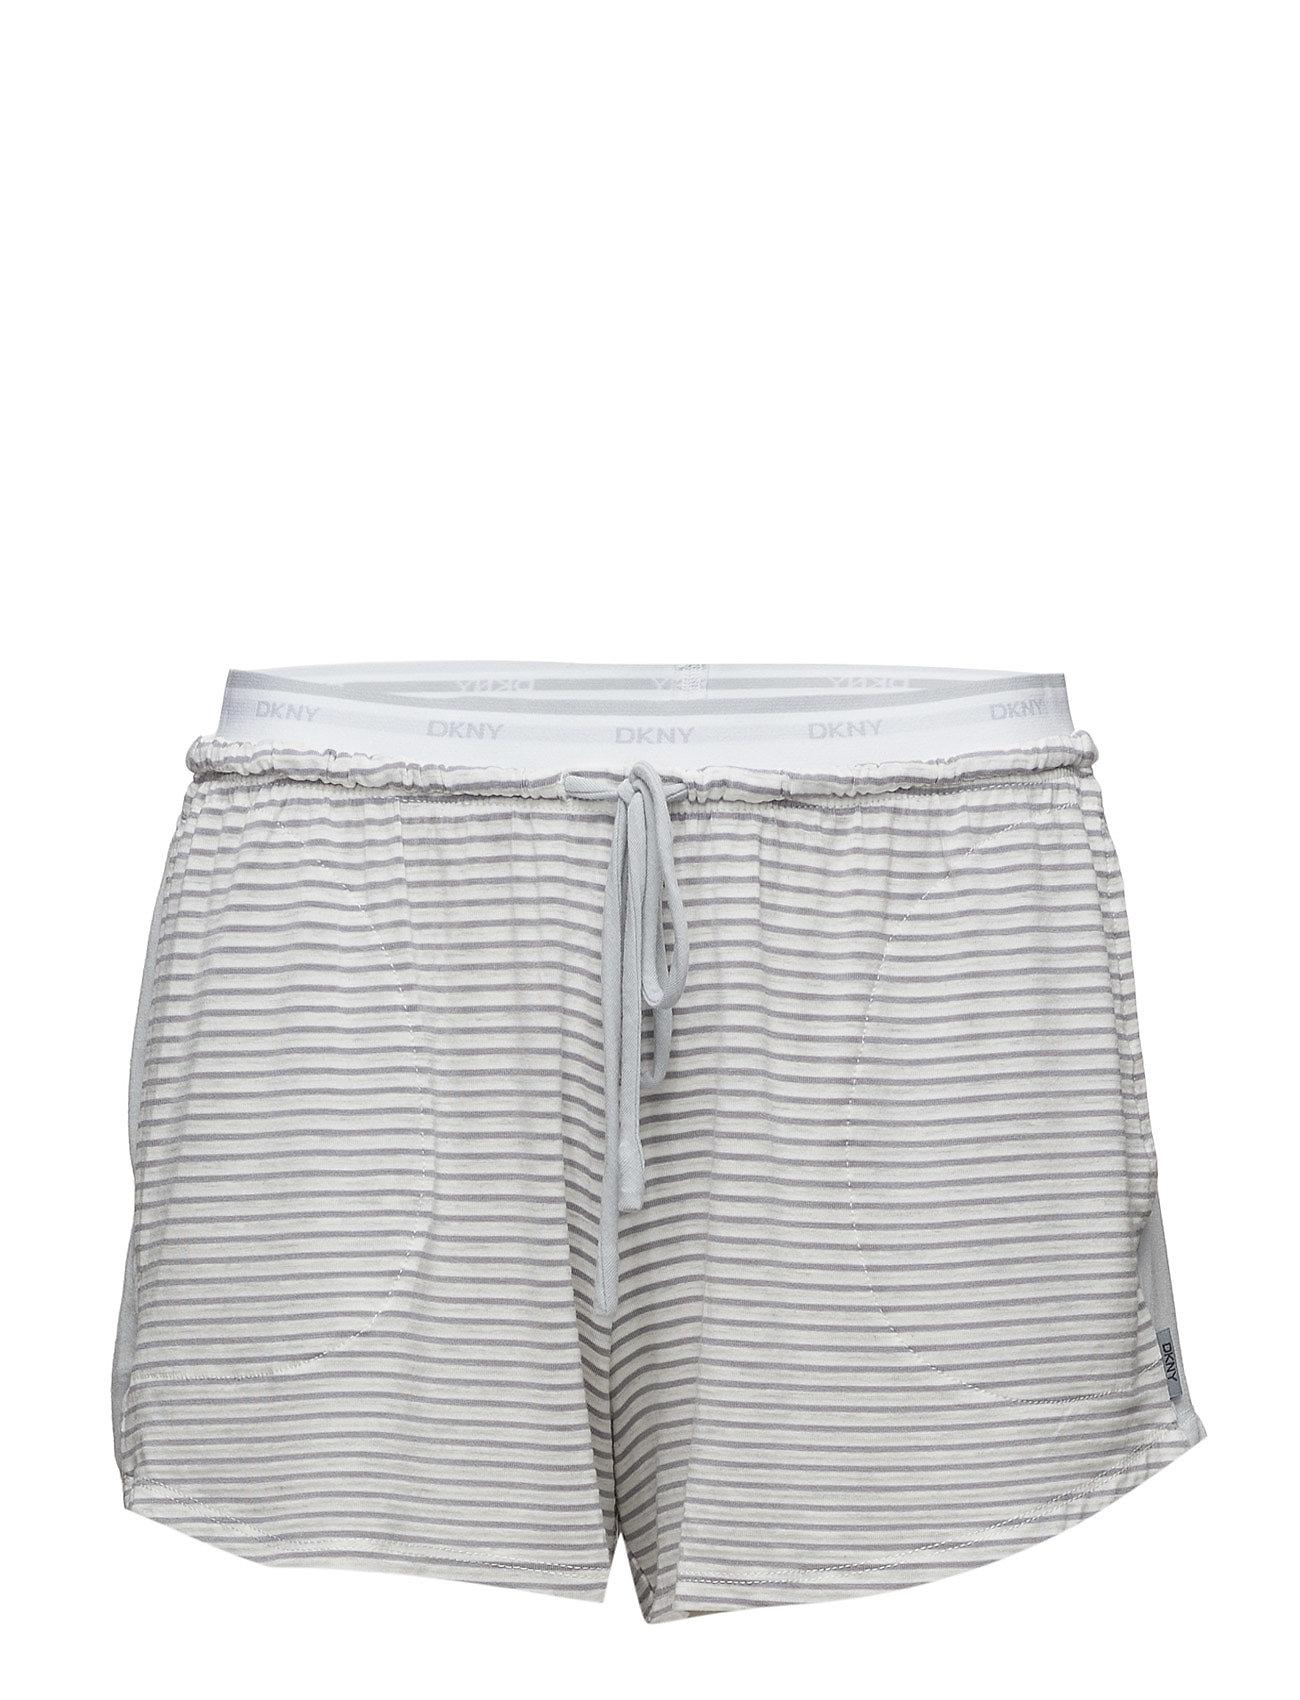 Dkny Clean Slate Boxer DKNY Homewear Loungewear til Kvinder i